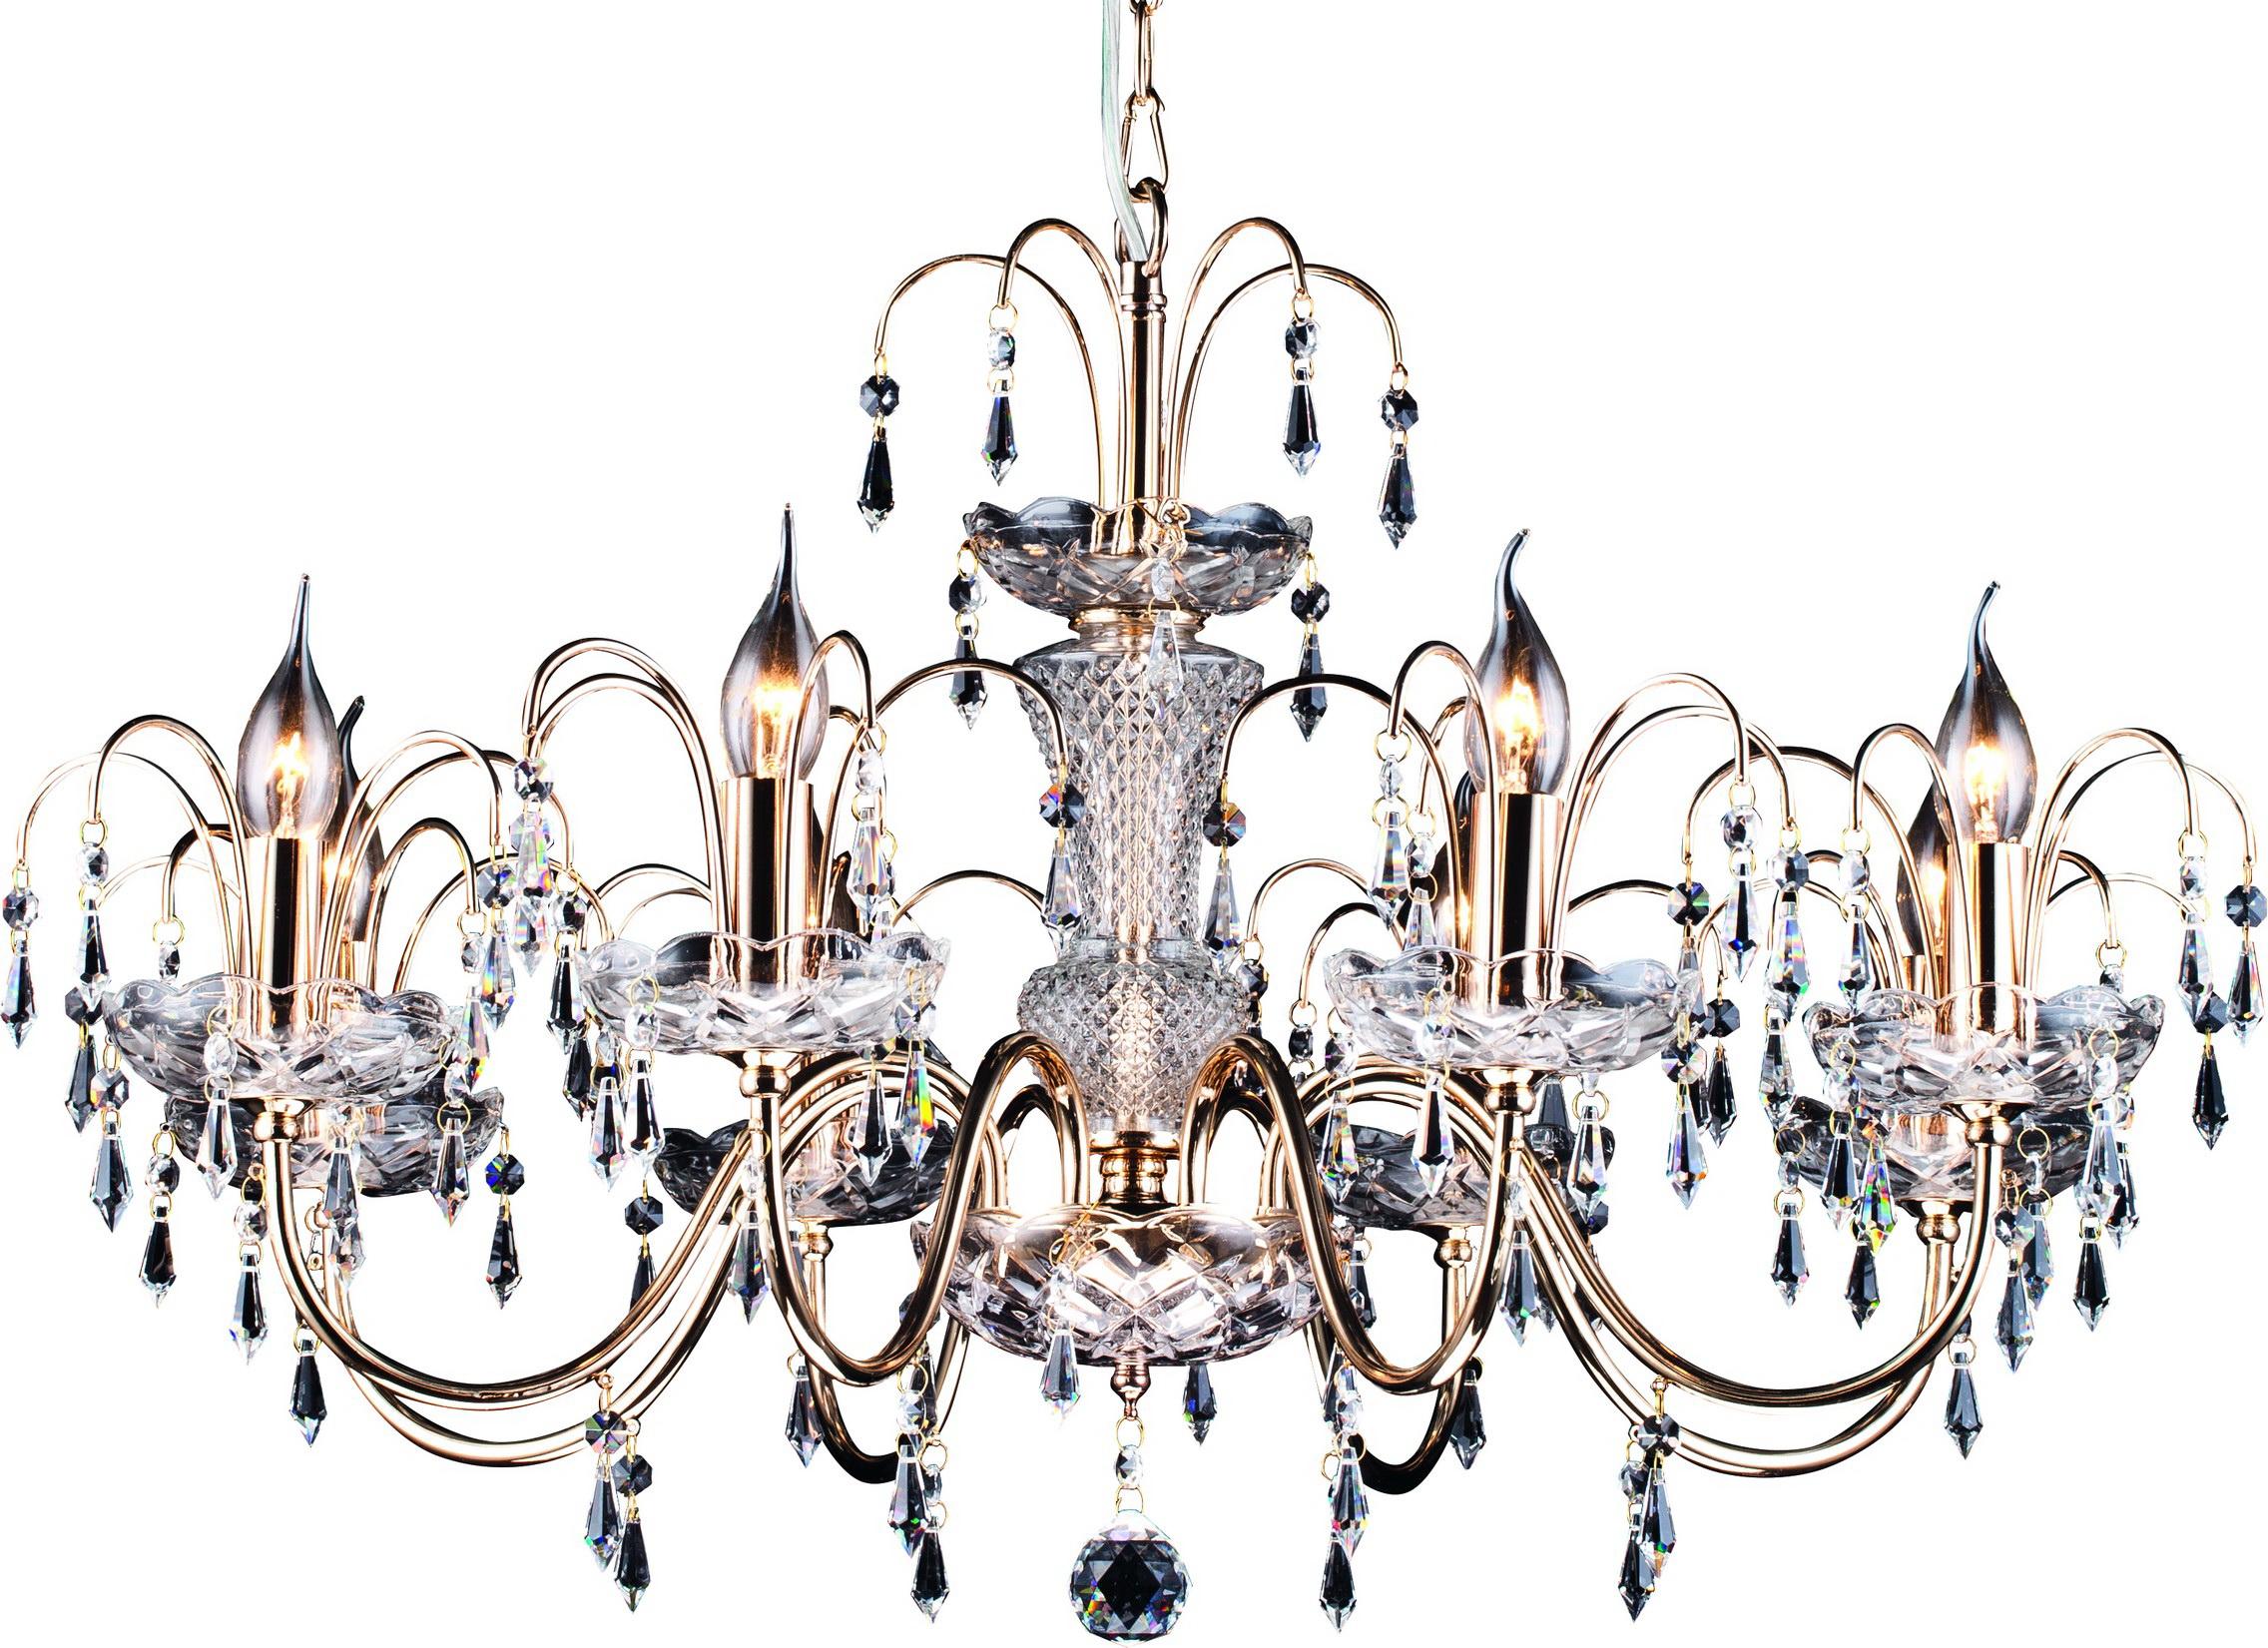 Люстра Arte lamp Sparkles a3054lm-8go люстра arte lamp sparkles a3054lm 8go